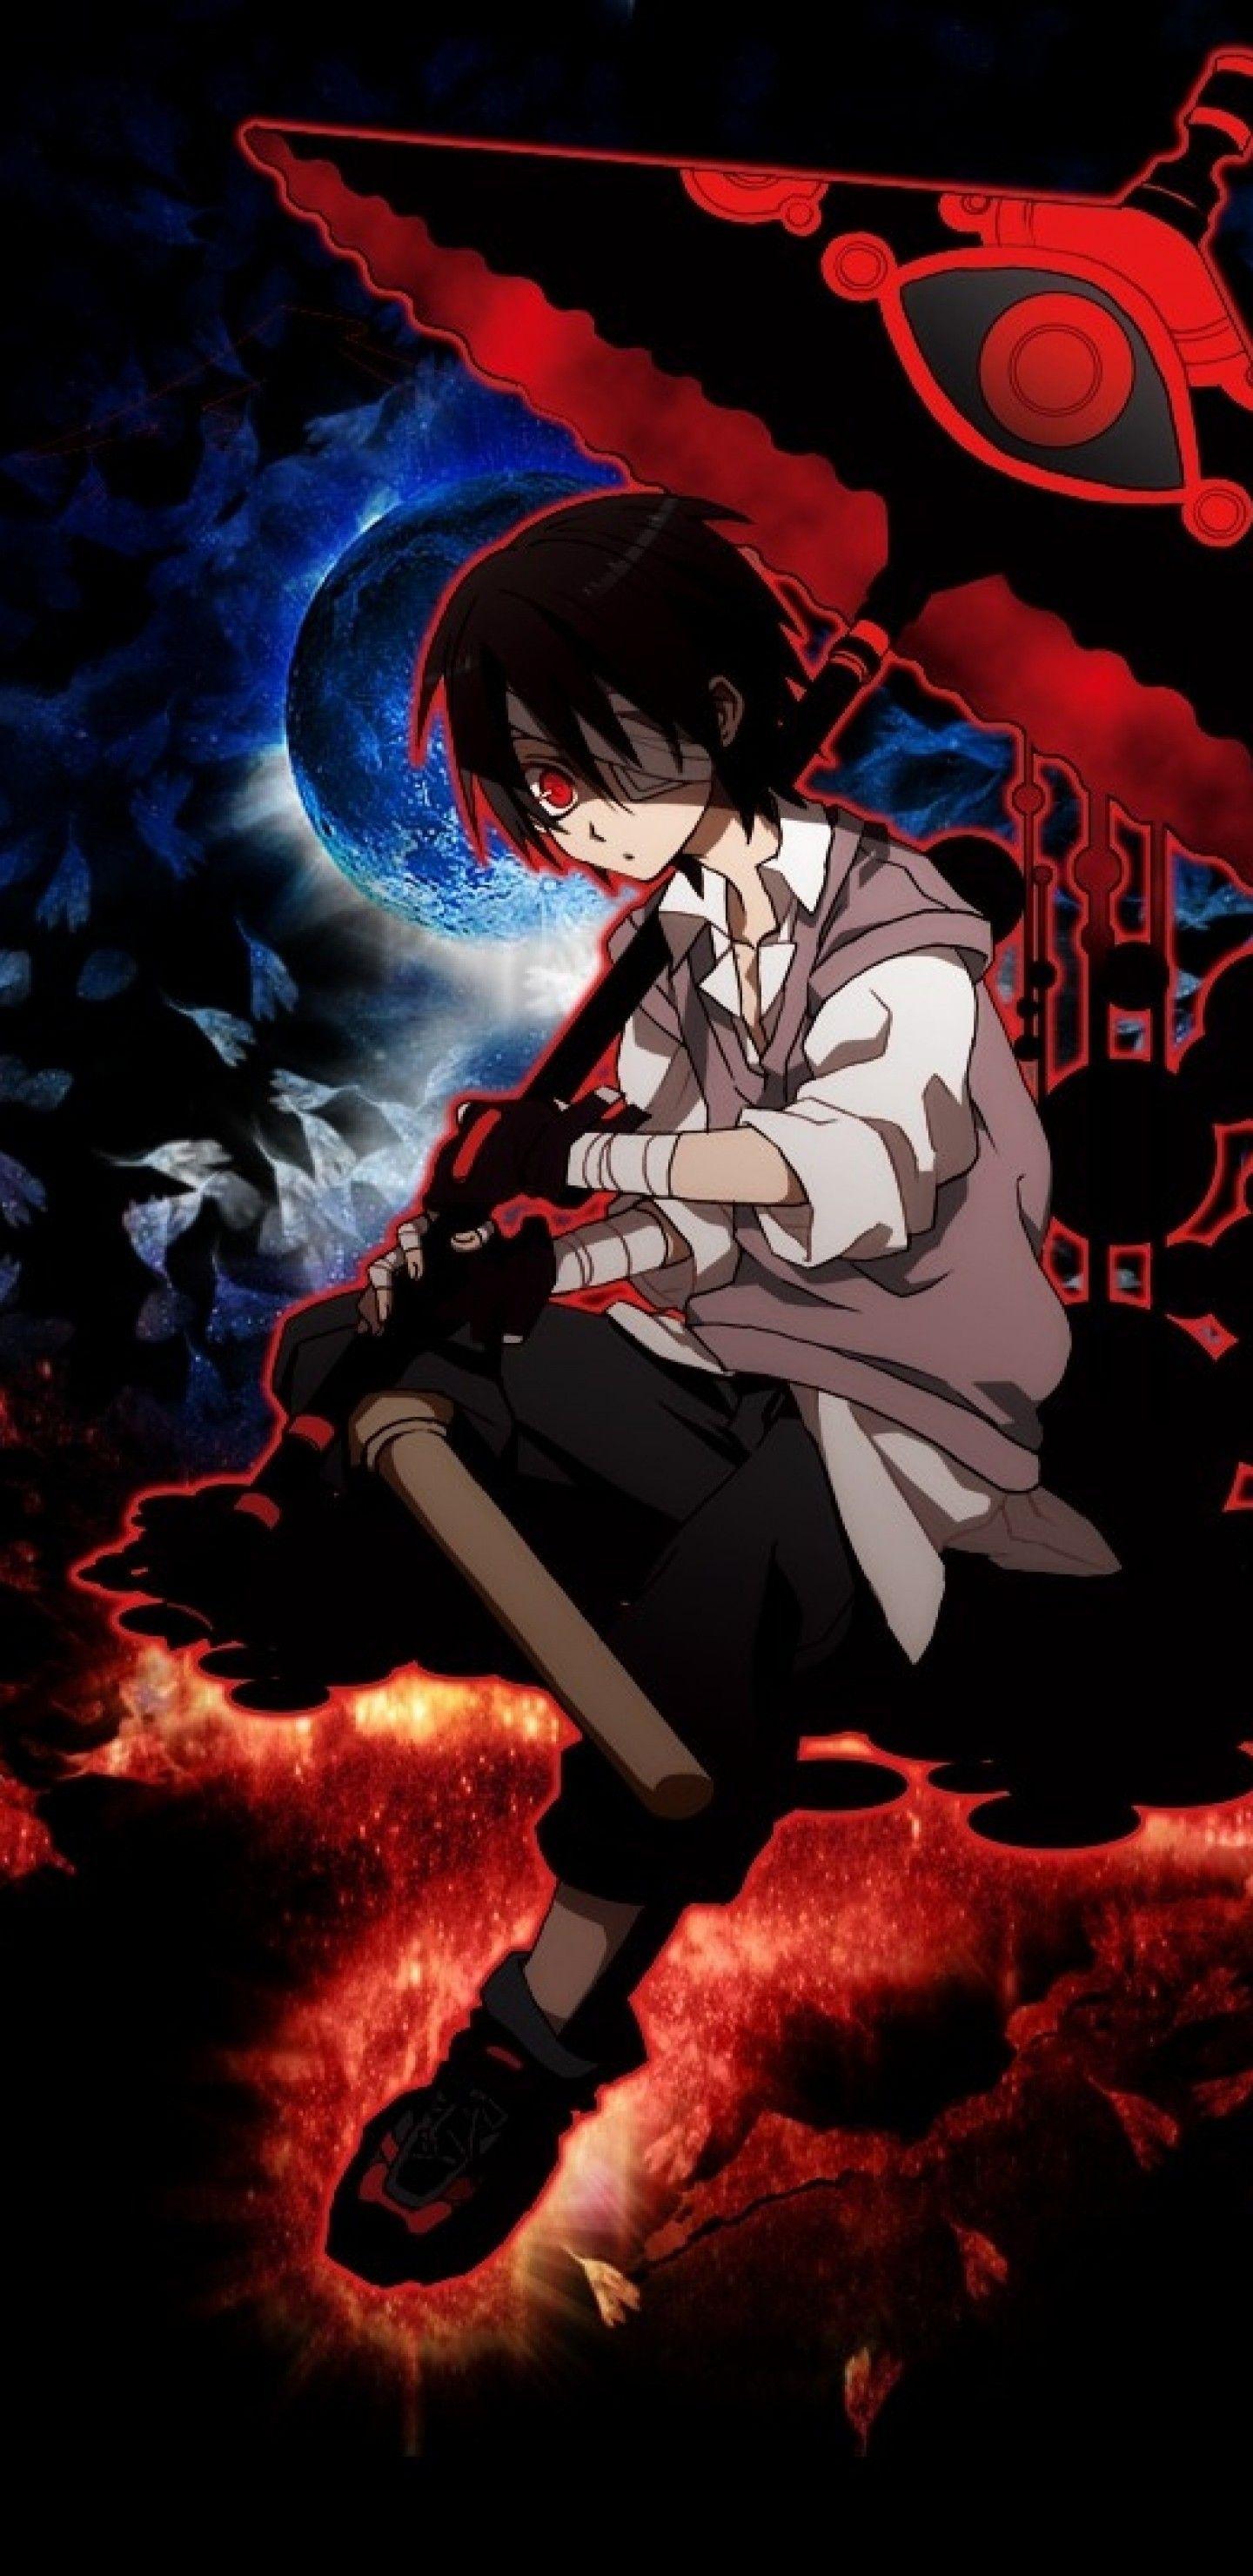 Dark Red Anime Boys Wallpapers Top Free Dark Red Anime Boys Backgrounds Wallpaperaccess